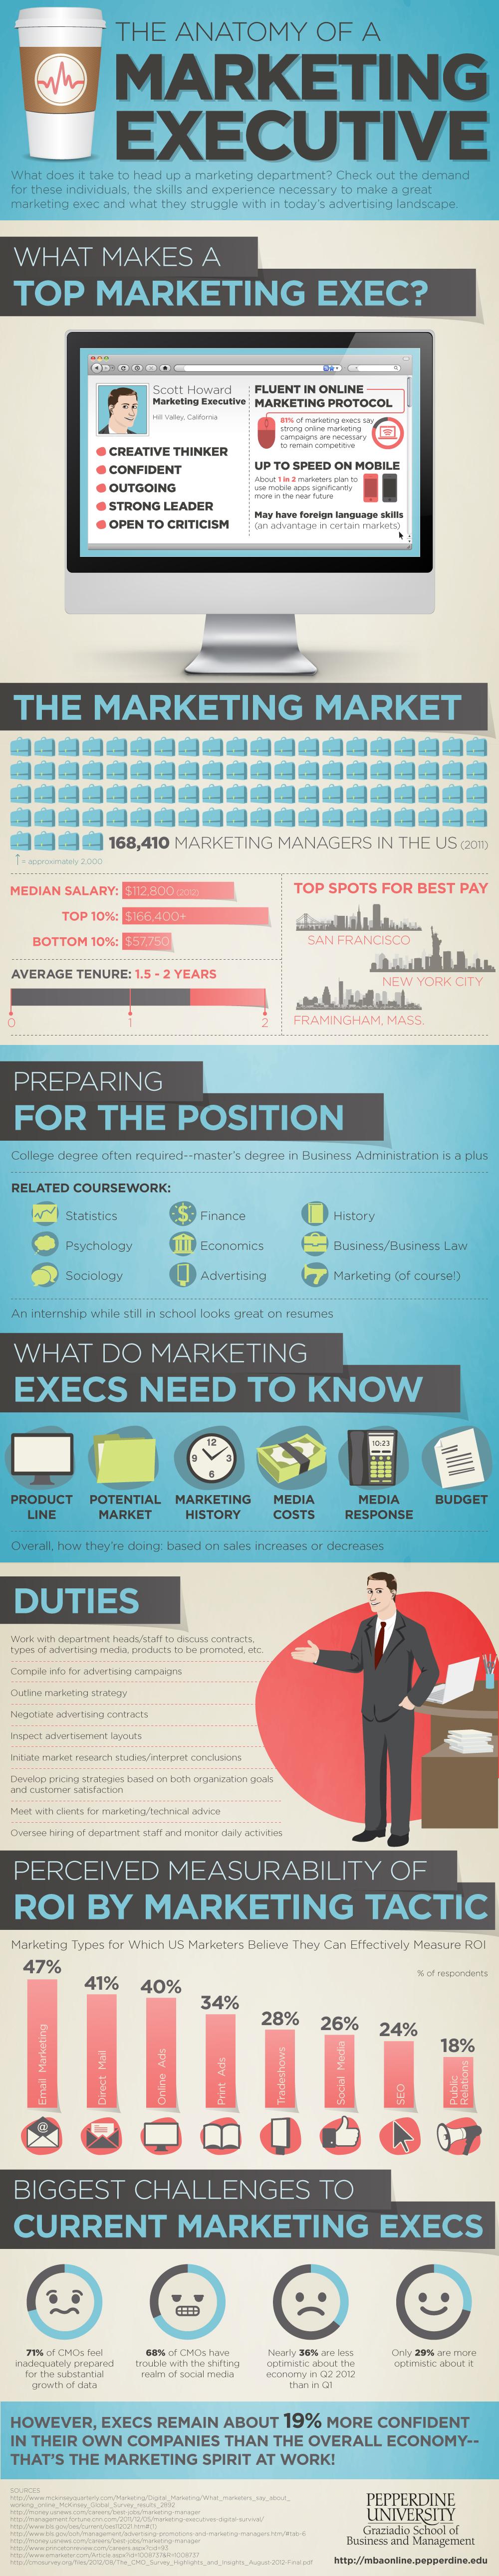 Anatomy of a Marketing Executive